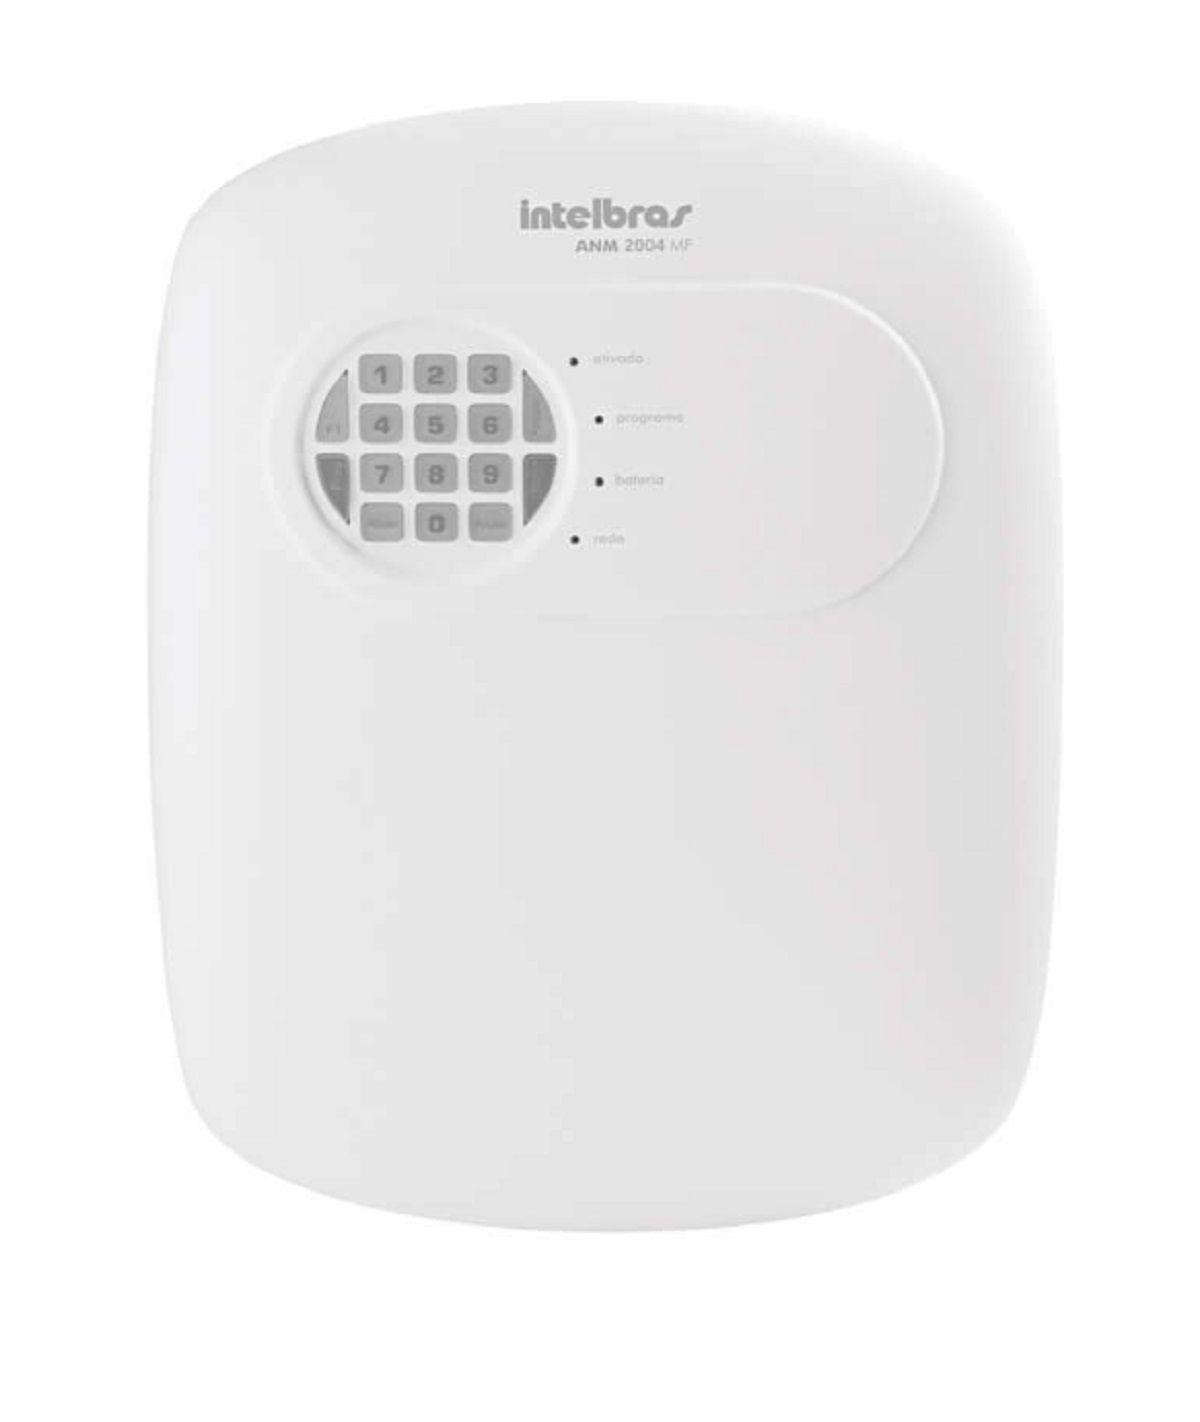 Kit Alarme Sem Fio Intelbras Casa Comercio 4 Sensores